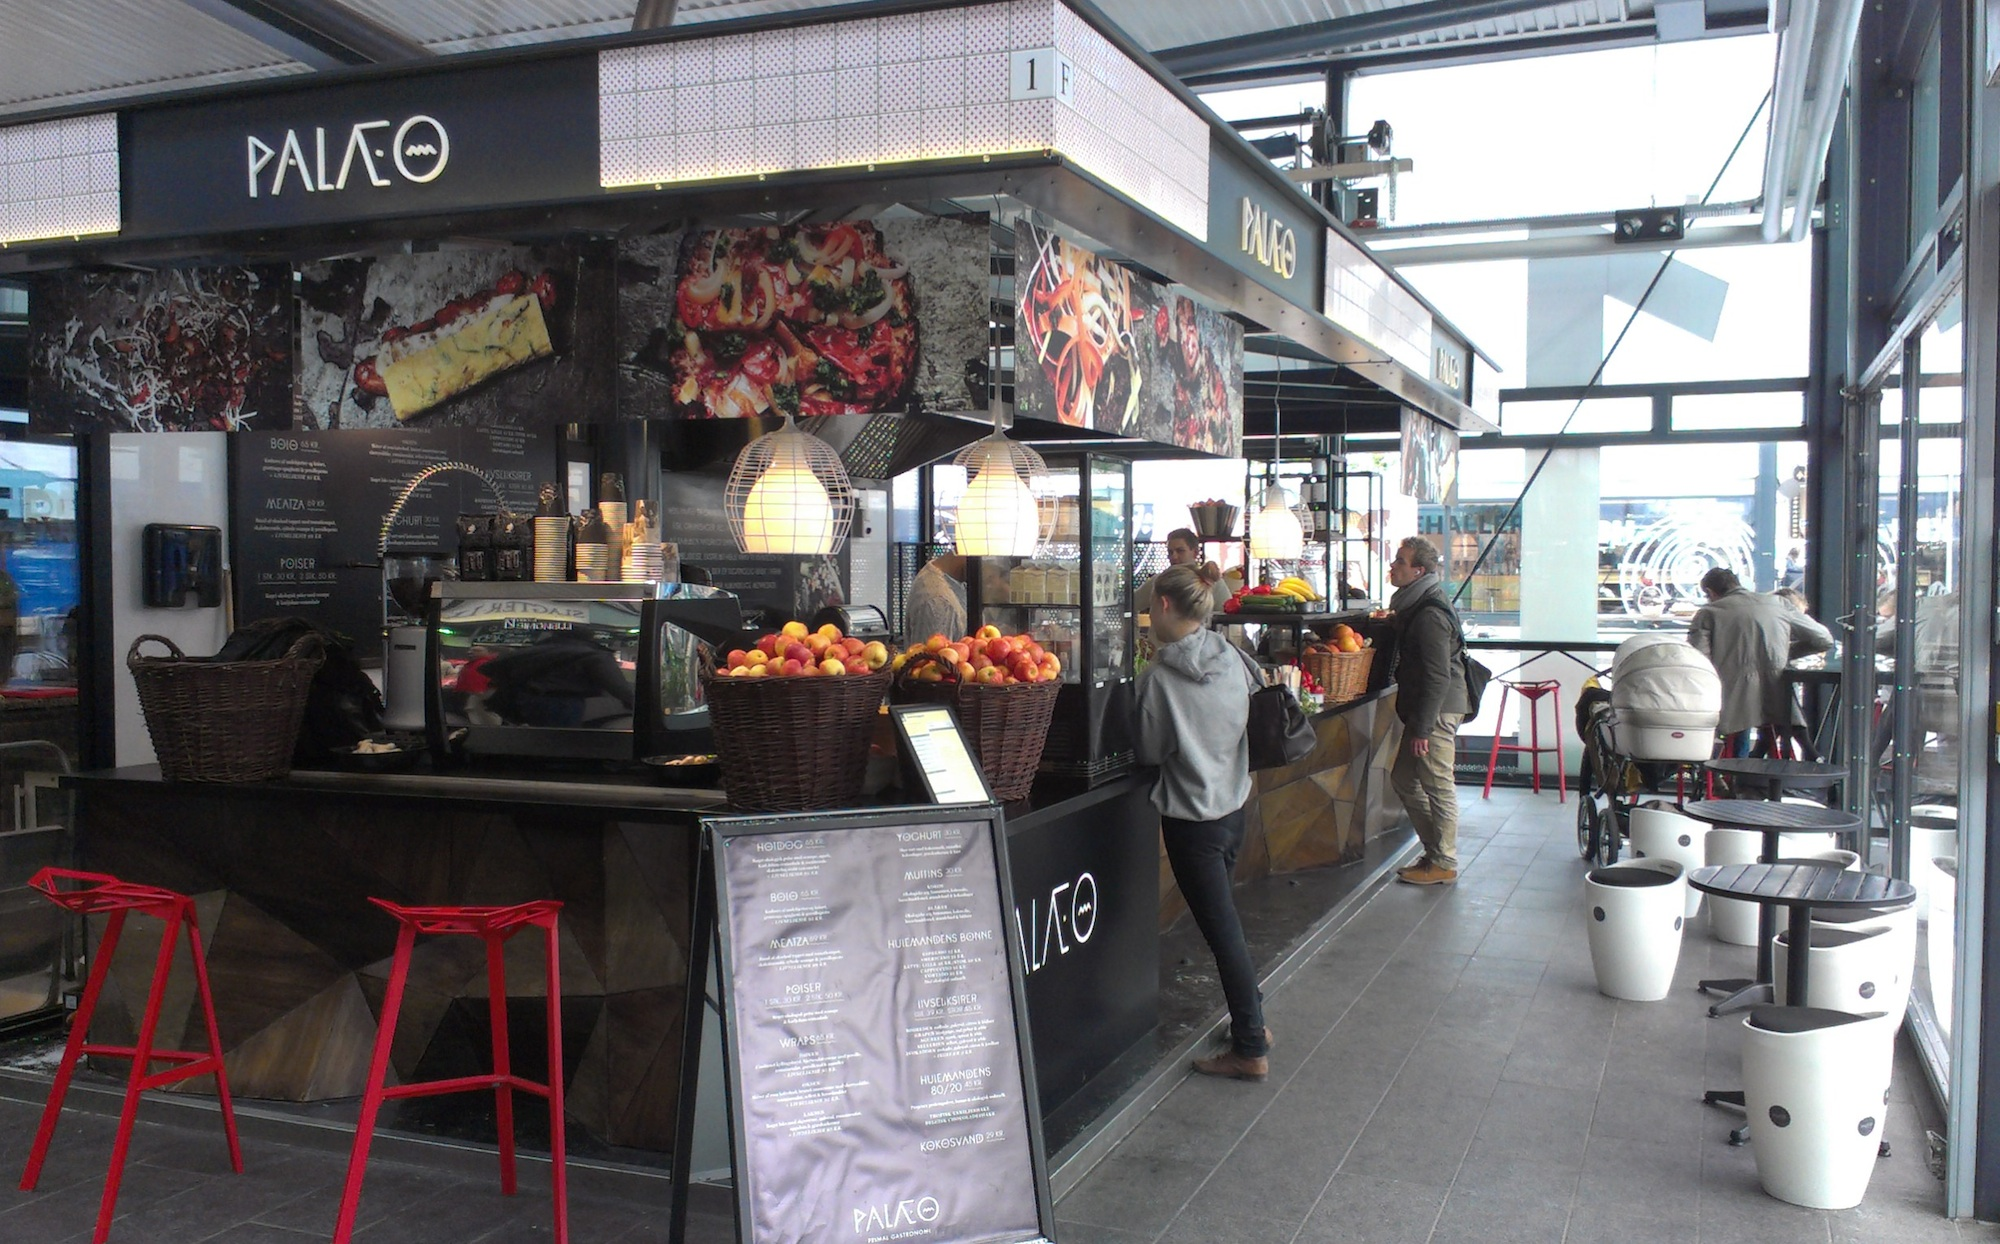 paleo restaurant, healthy places to visit in copenhagen, by healthista.com